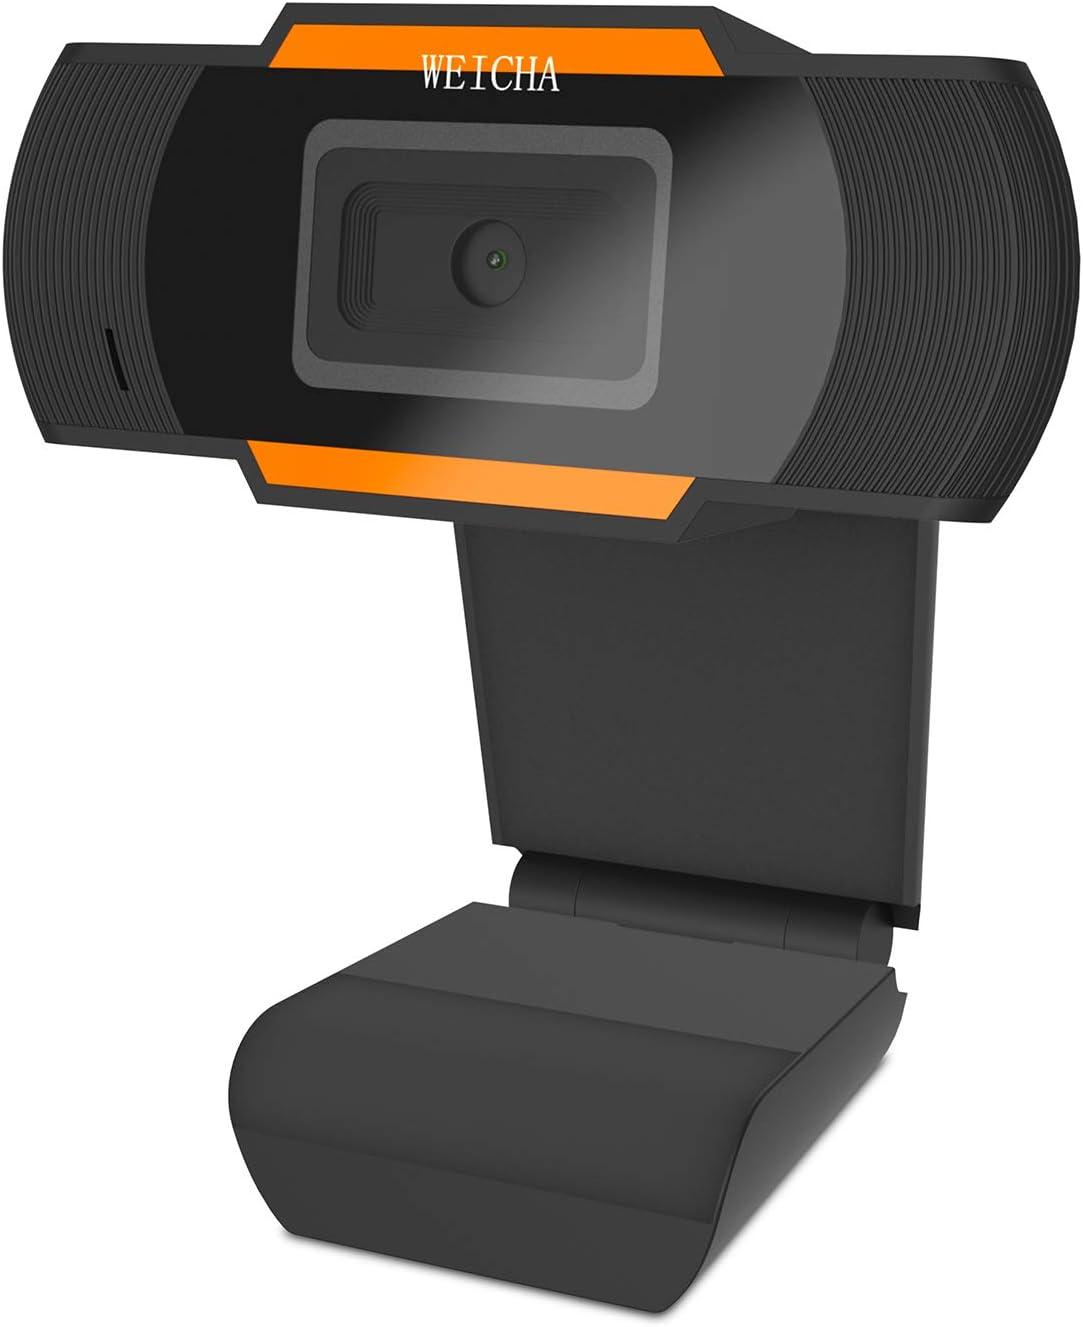 1080P HD Webcam with Microphone, Webcam for Gaming Conferencing, Laptop or Desktop Webcam, USB Computer Camera for Mac, Free-Driver Installation Fast Autofocus Orange